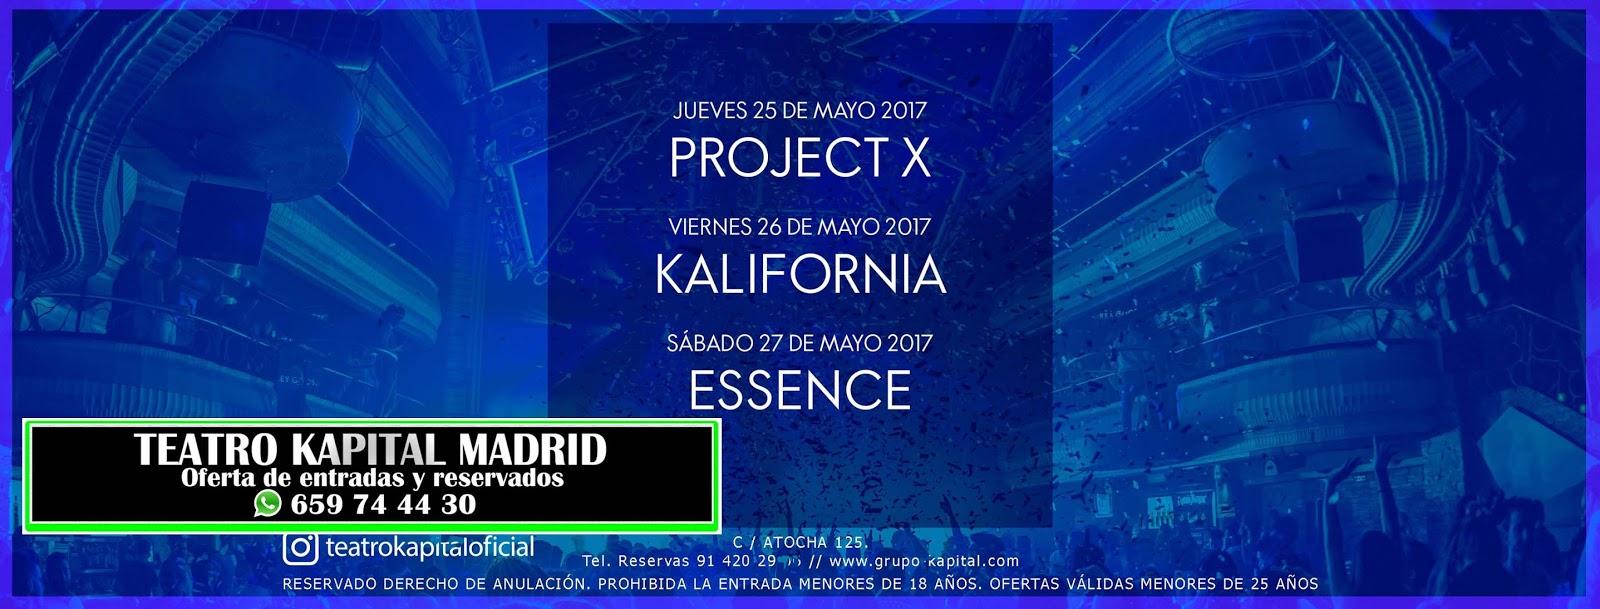 Discoteca kapital madrid 659 744 430 whatsapp mayo 2017 for Kapital jueves gratis